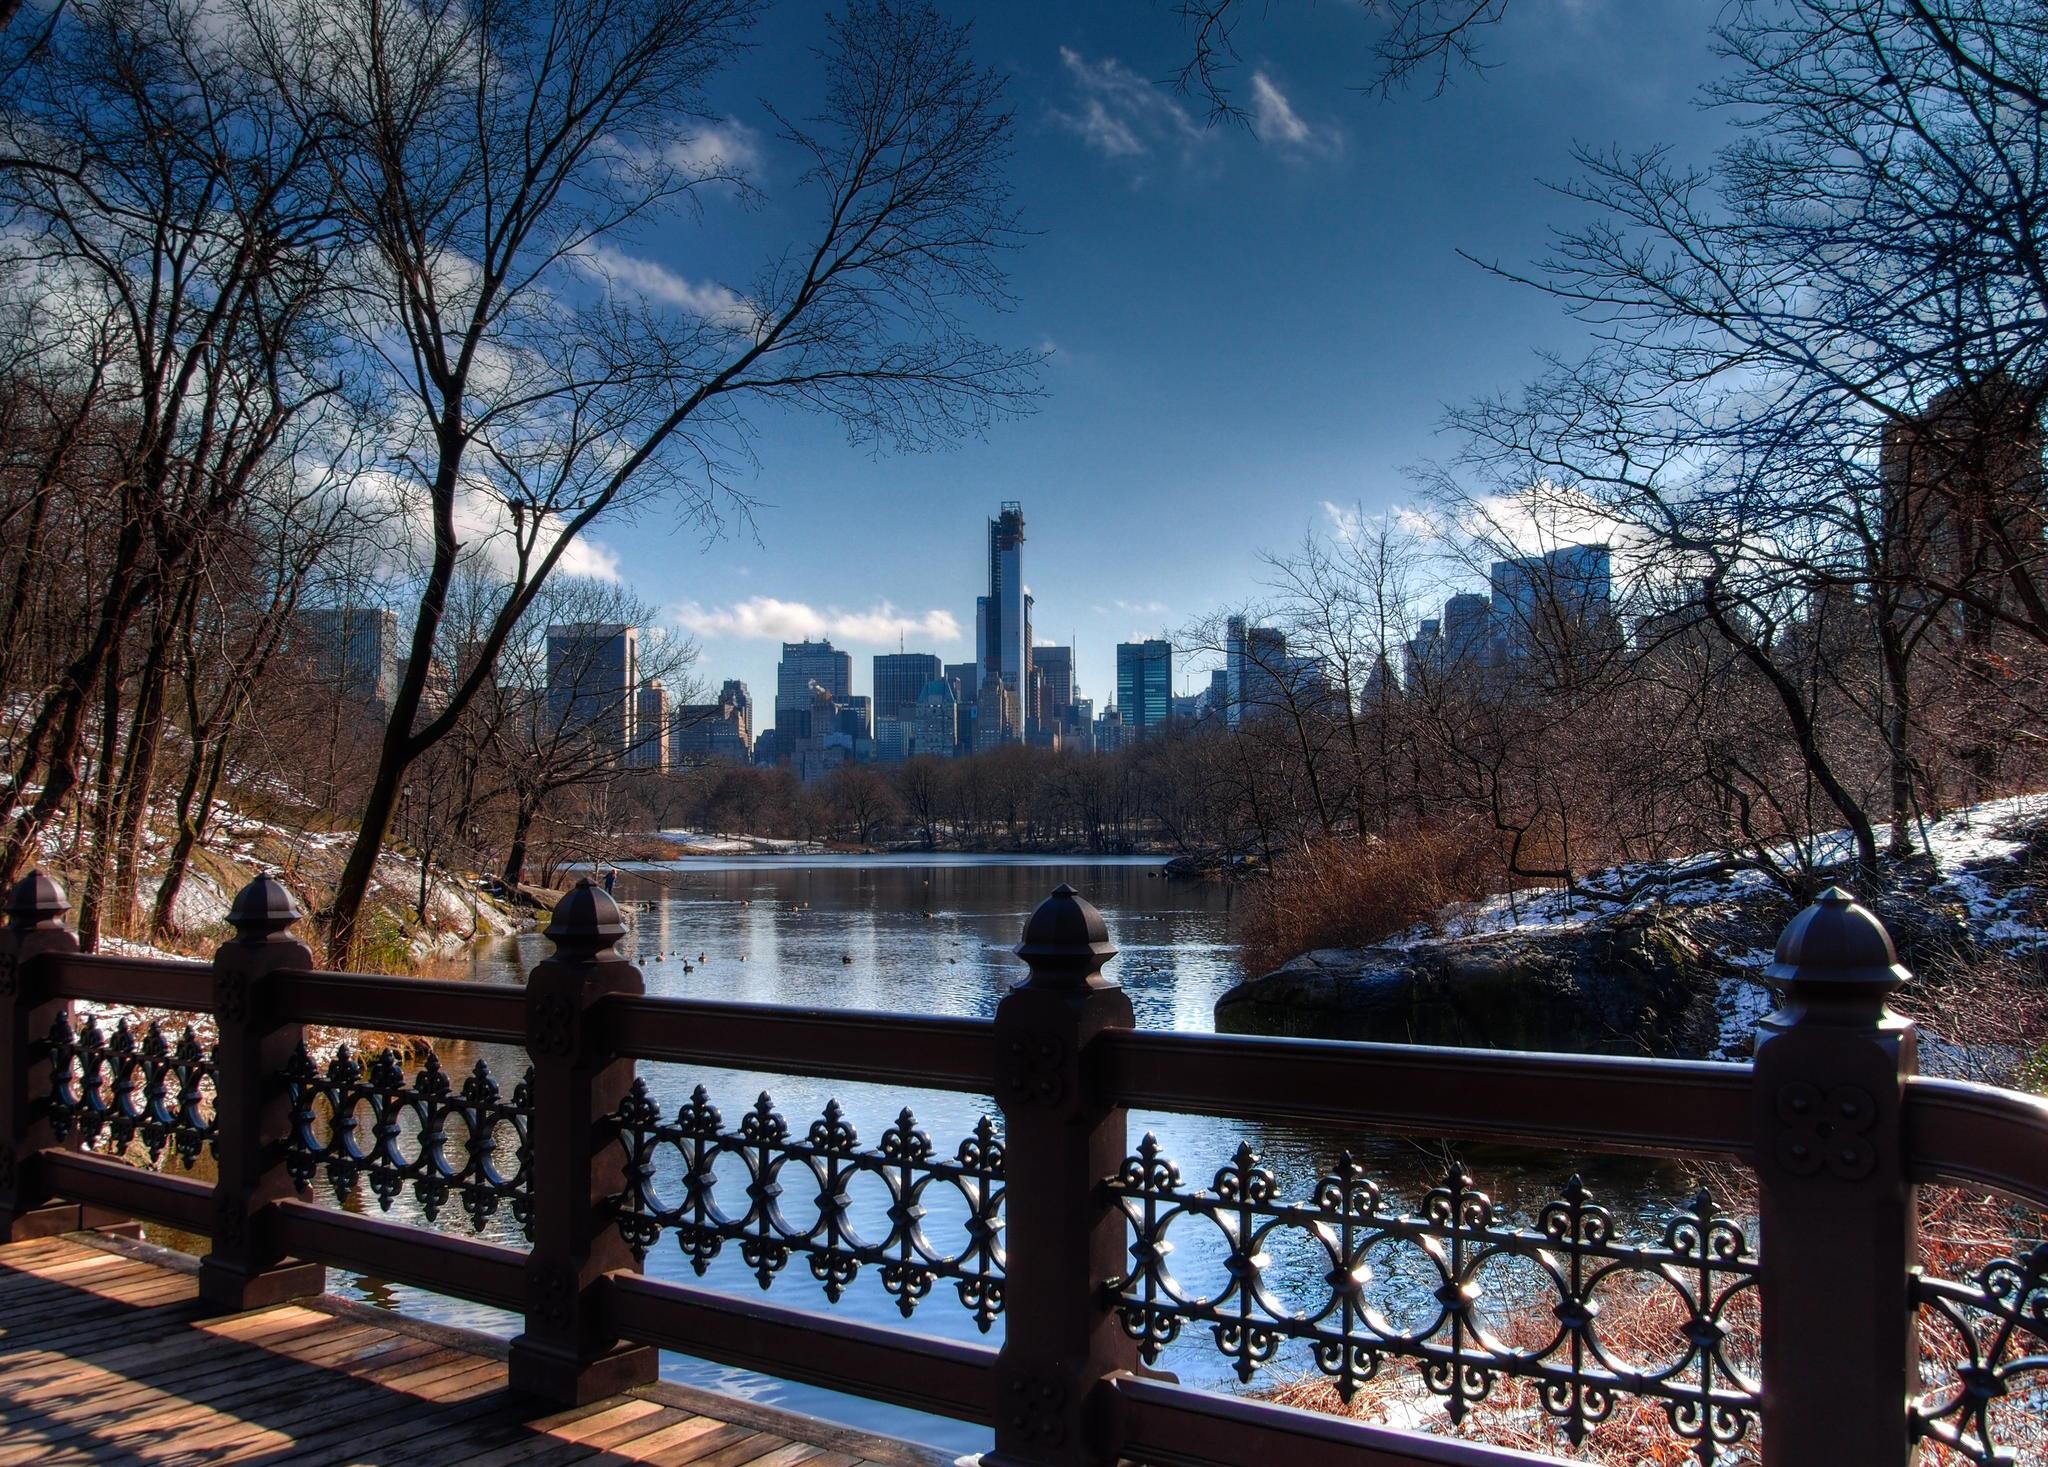 Iphone Wallpaper Pinterest Fondos De Pantalla De Nueva York Wallpapers New York Hd